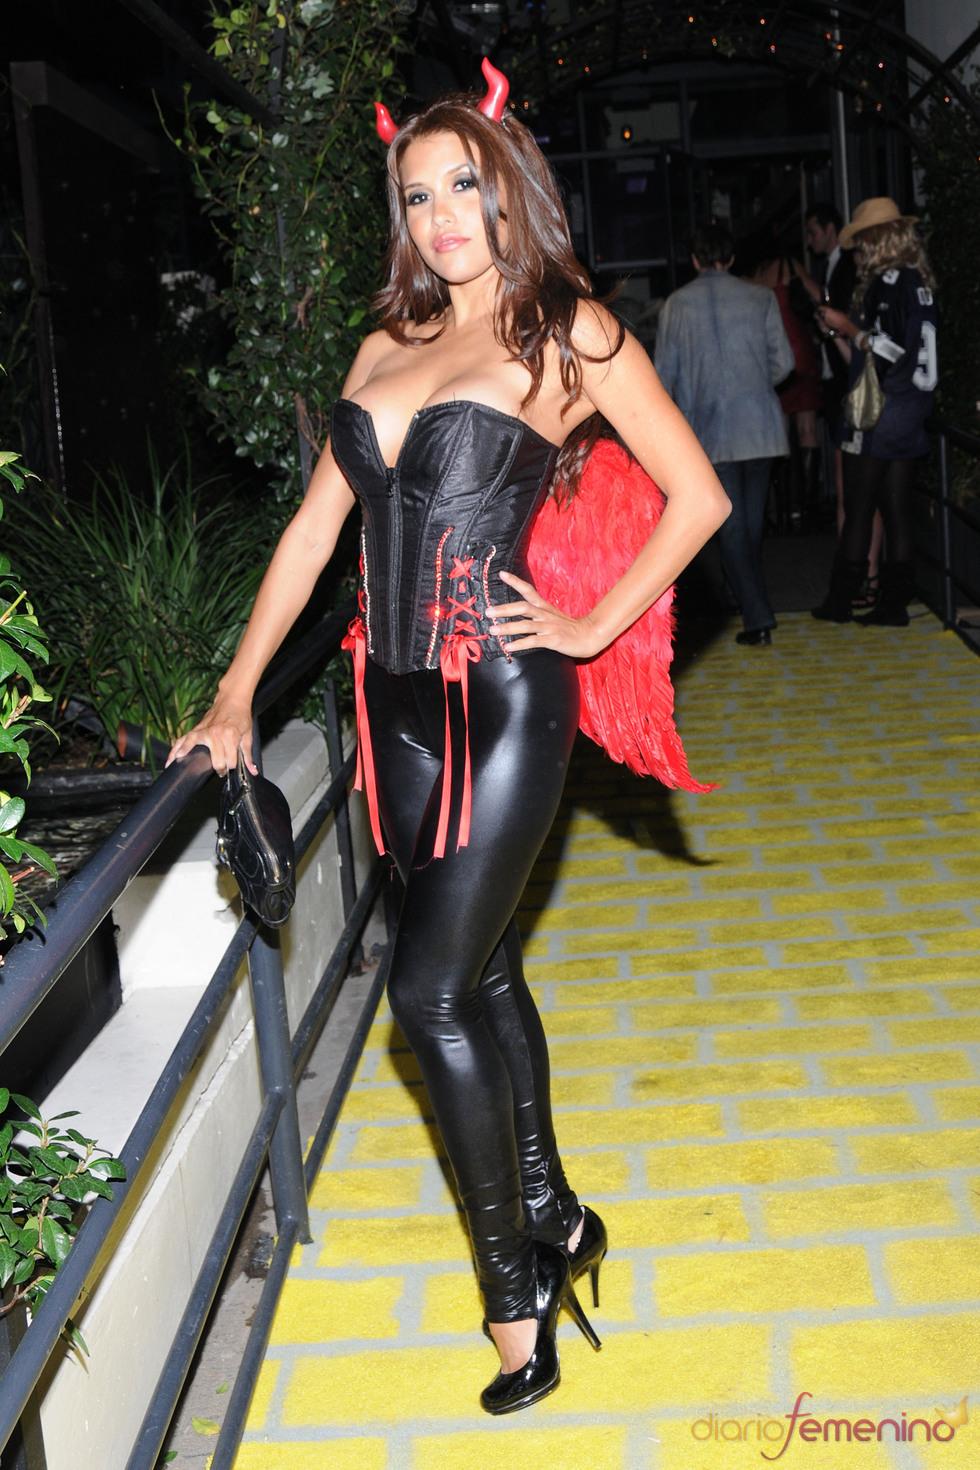 La actriz Rachel Sterling disfrazada de diablesa en Halloween